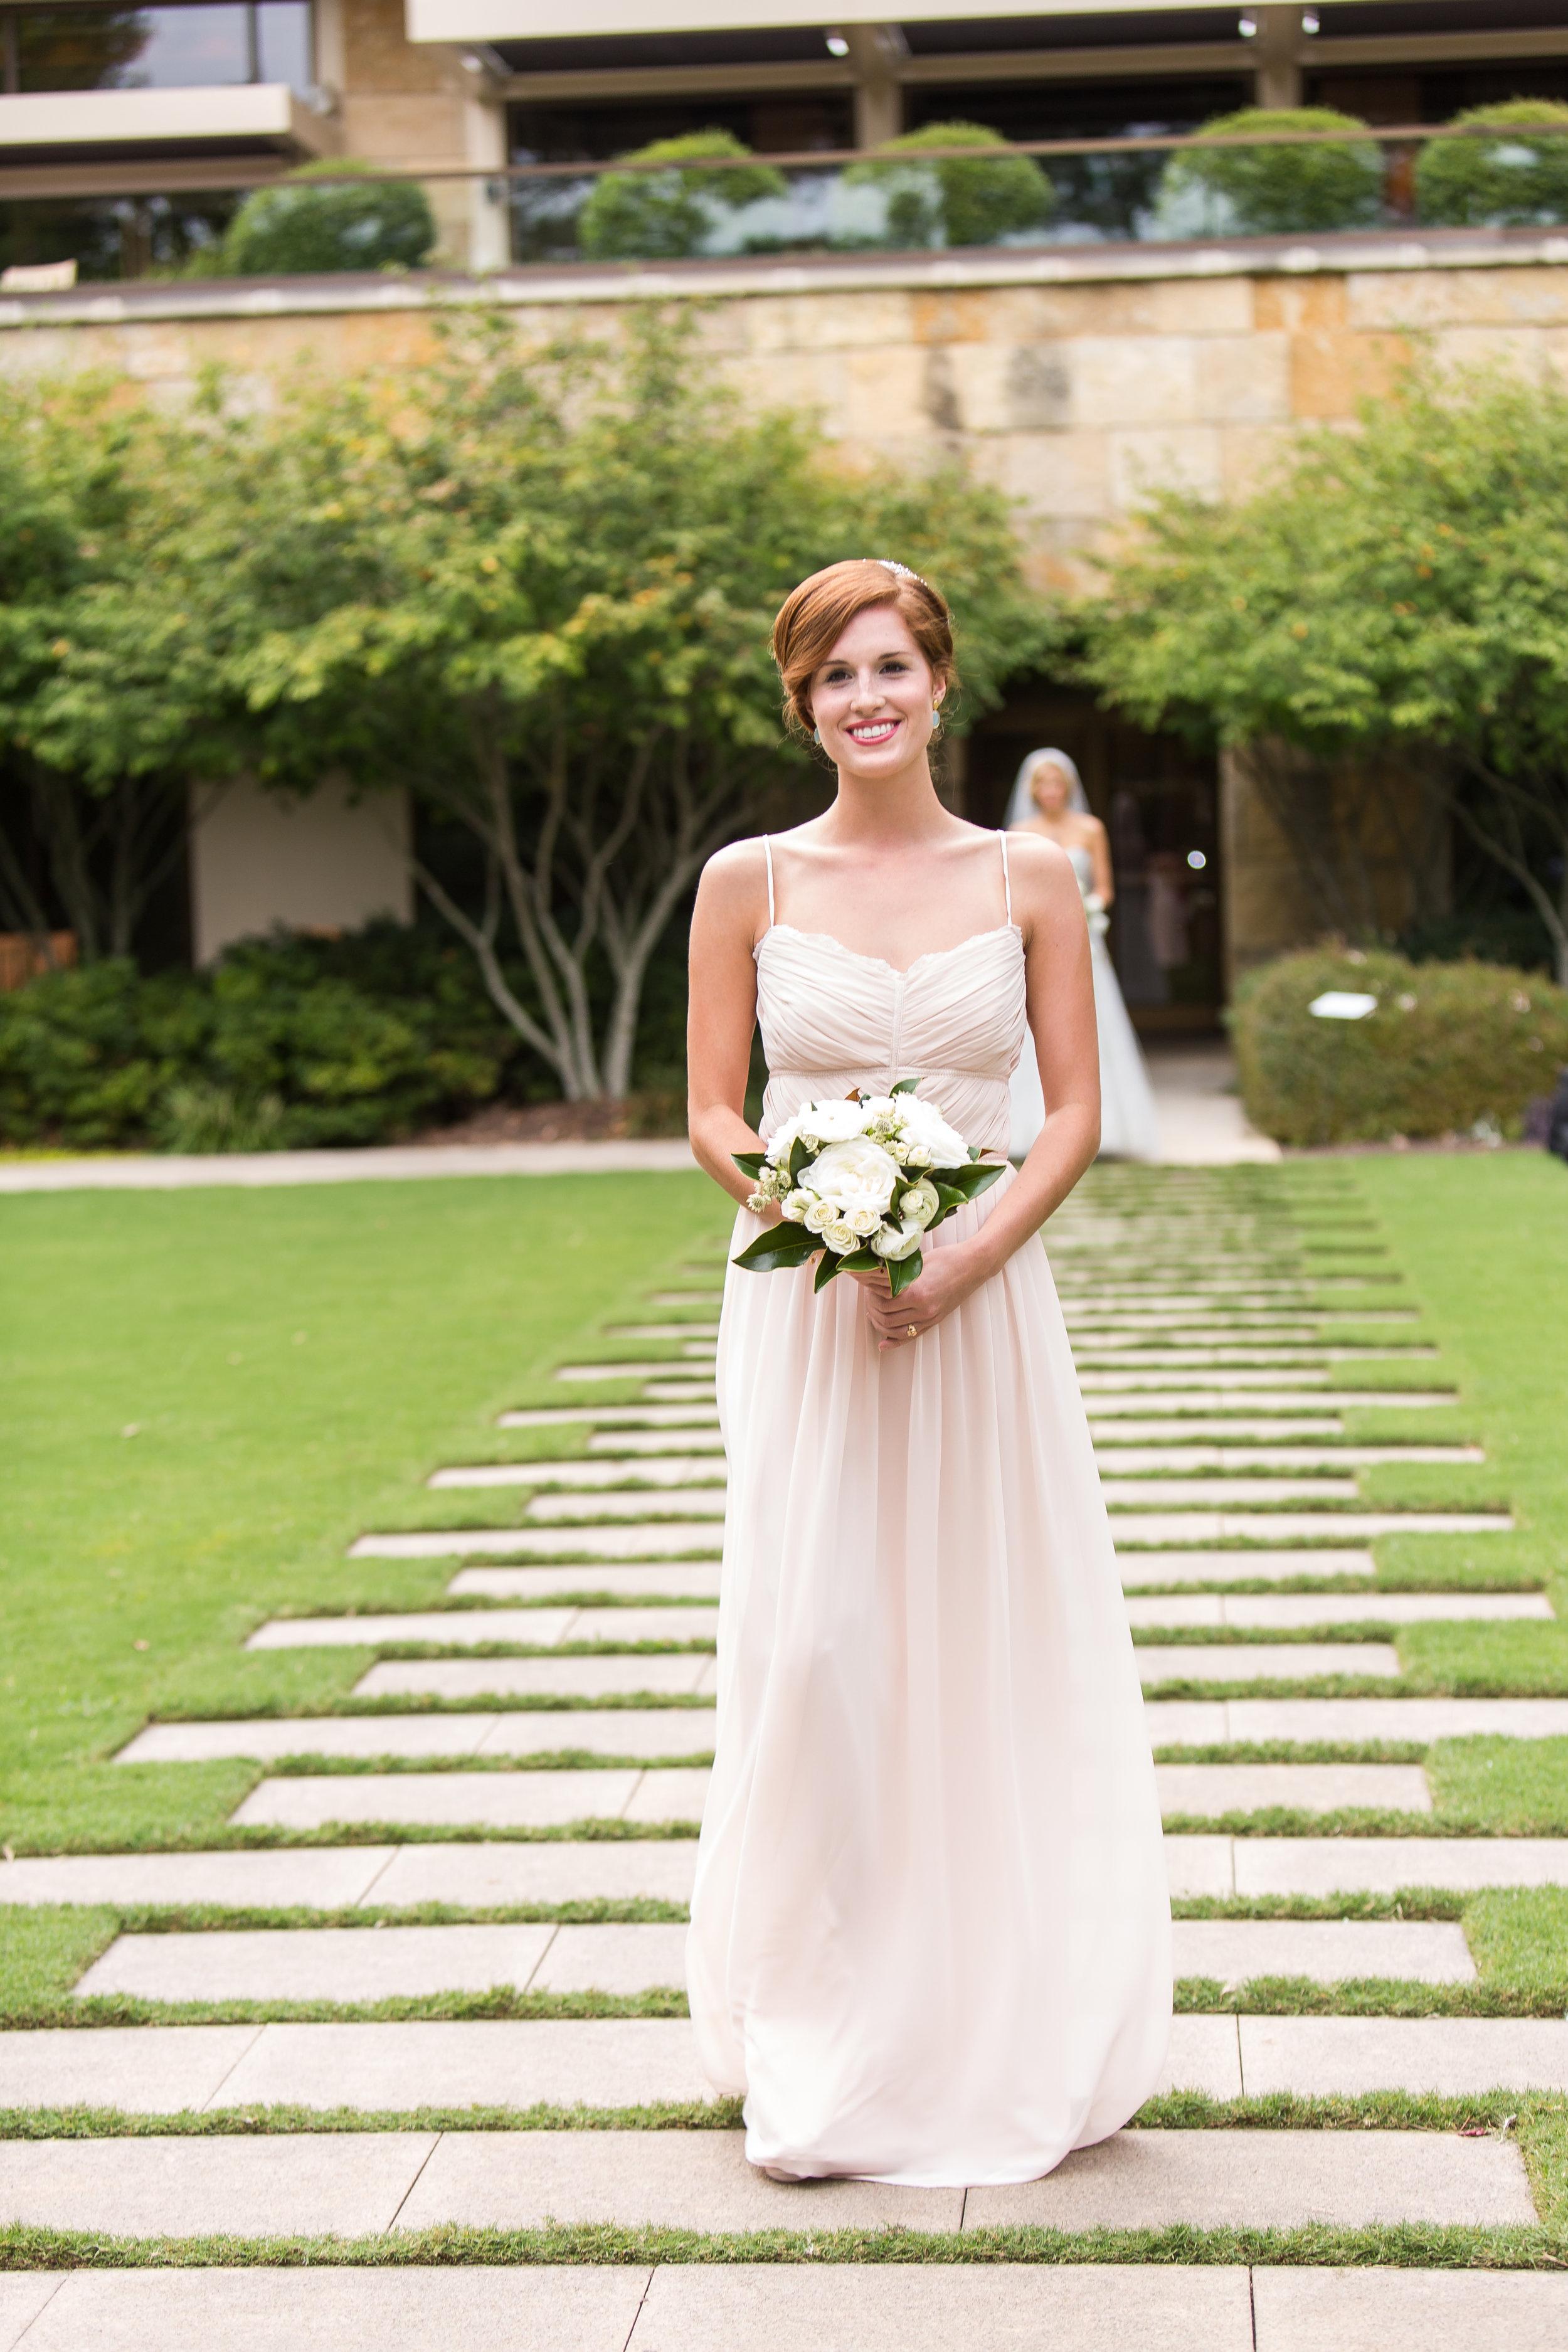 Bridesmaid Bouquet, Umstead Wedding